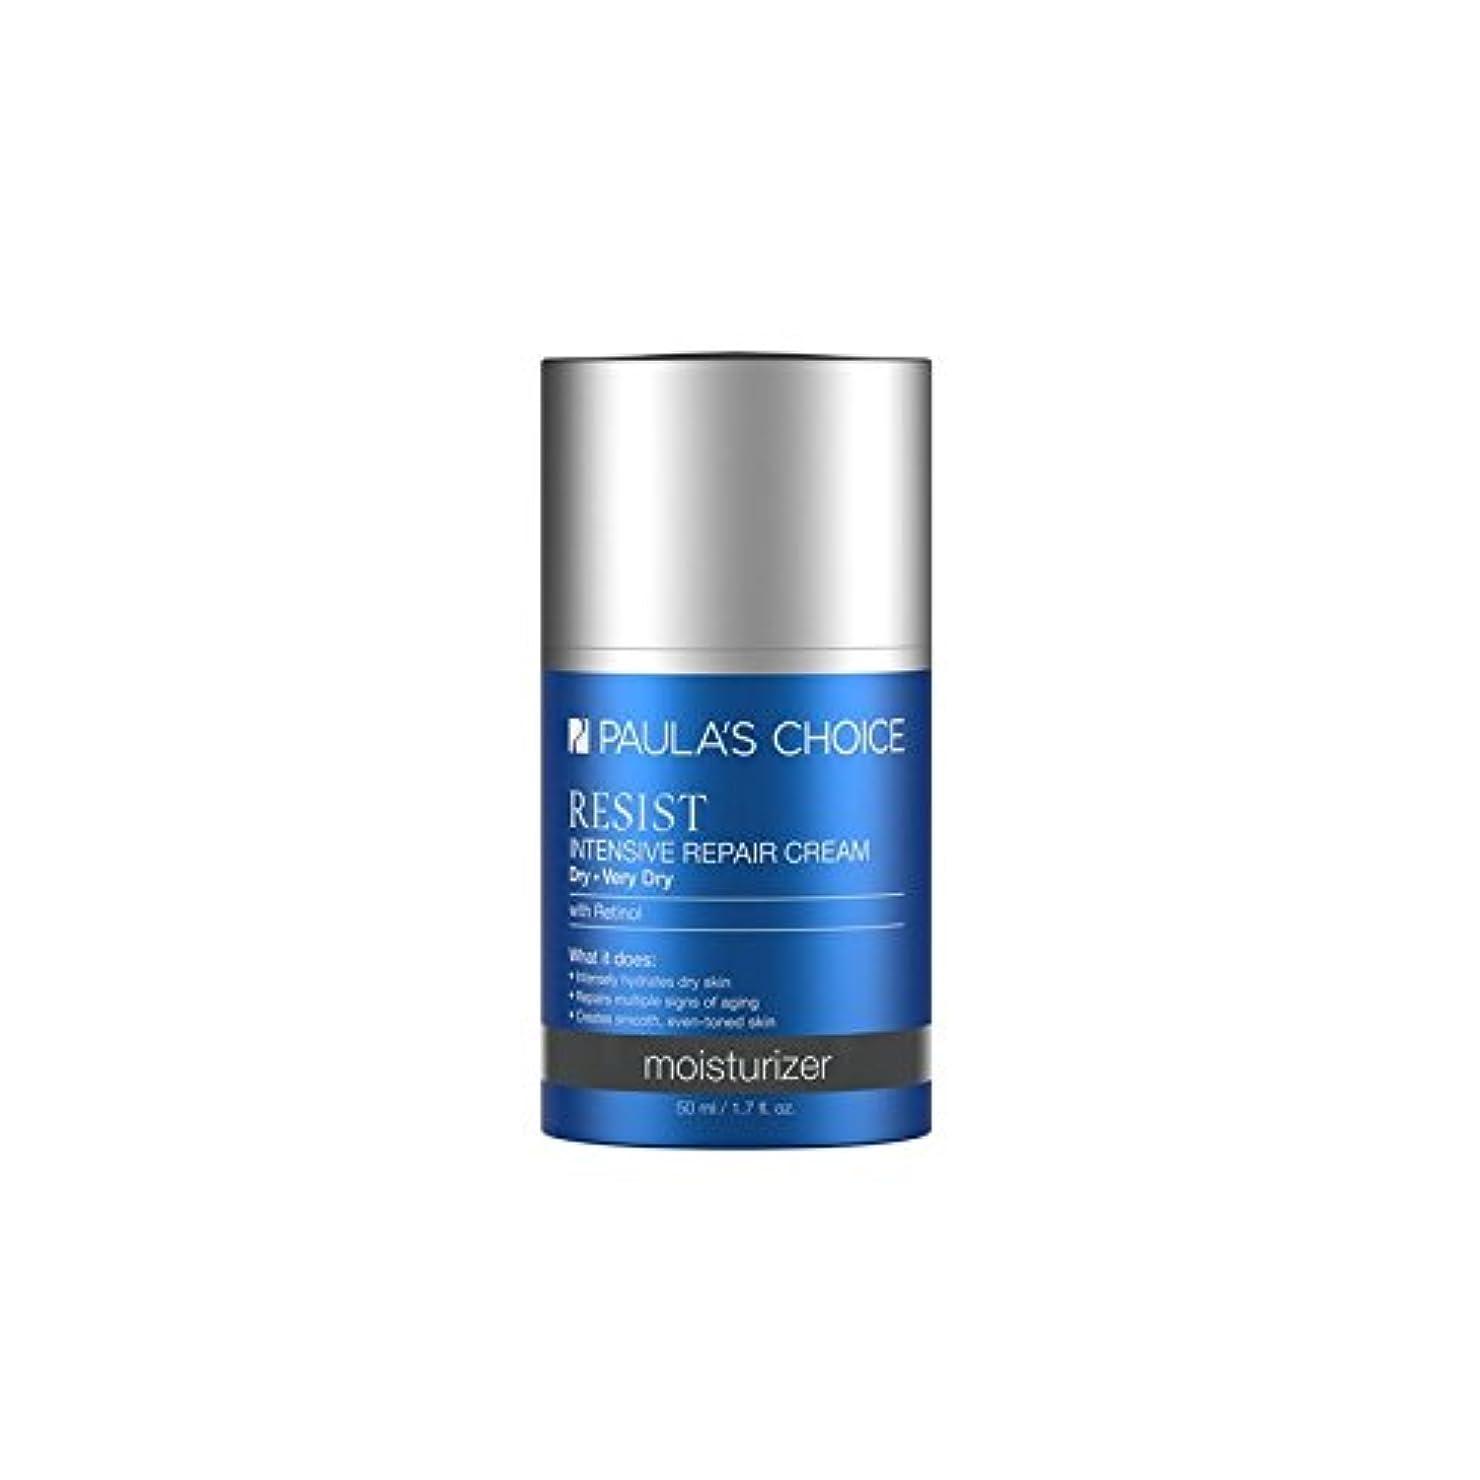 Paula's Choice Resist Intensive Repair Cream (50ml) - ポーラチョイスの集中リペアクリーム(50)に抵抗します [並行輸入品]